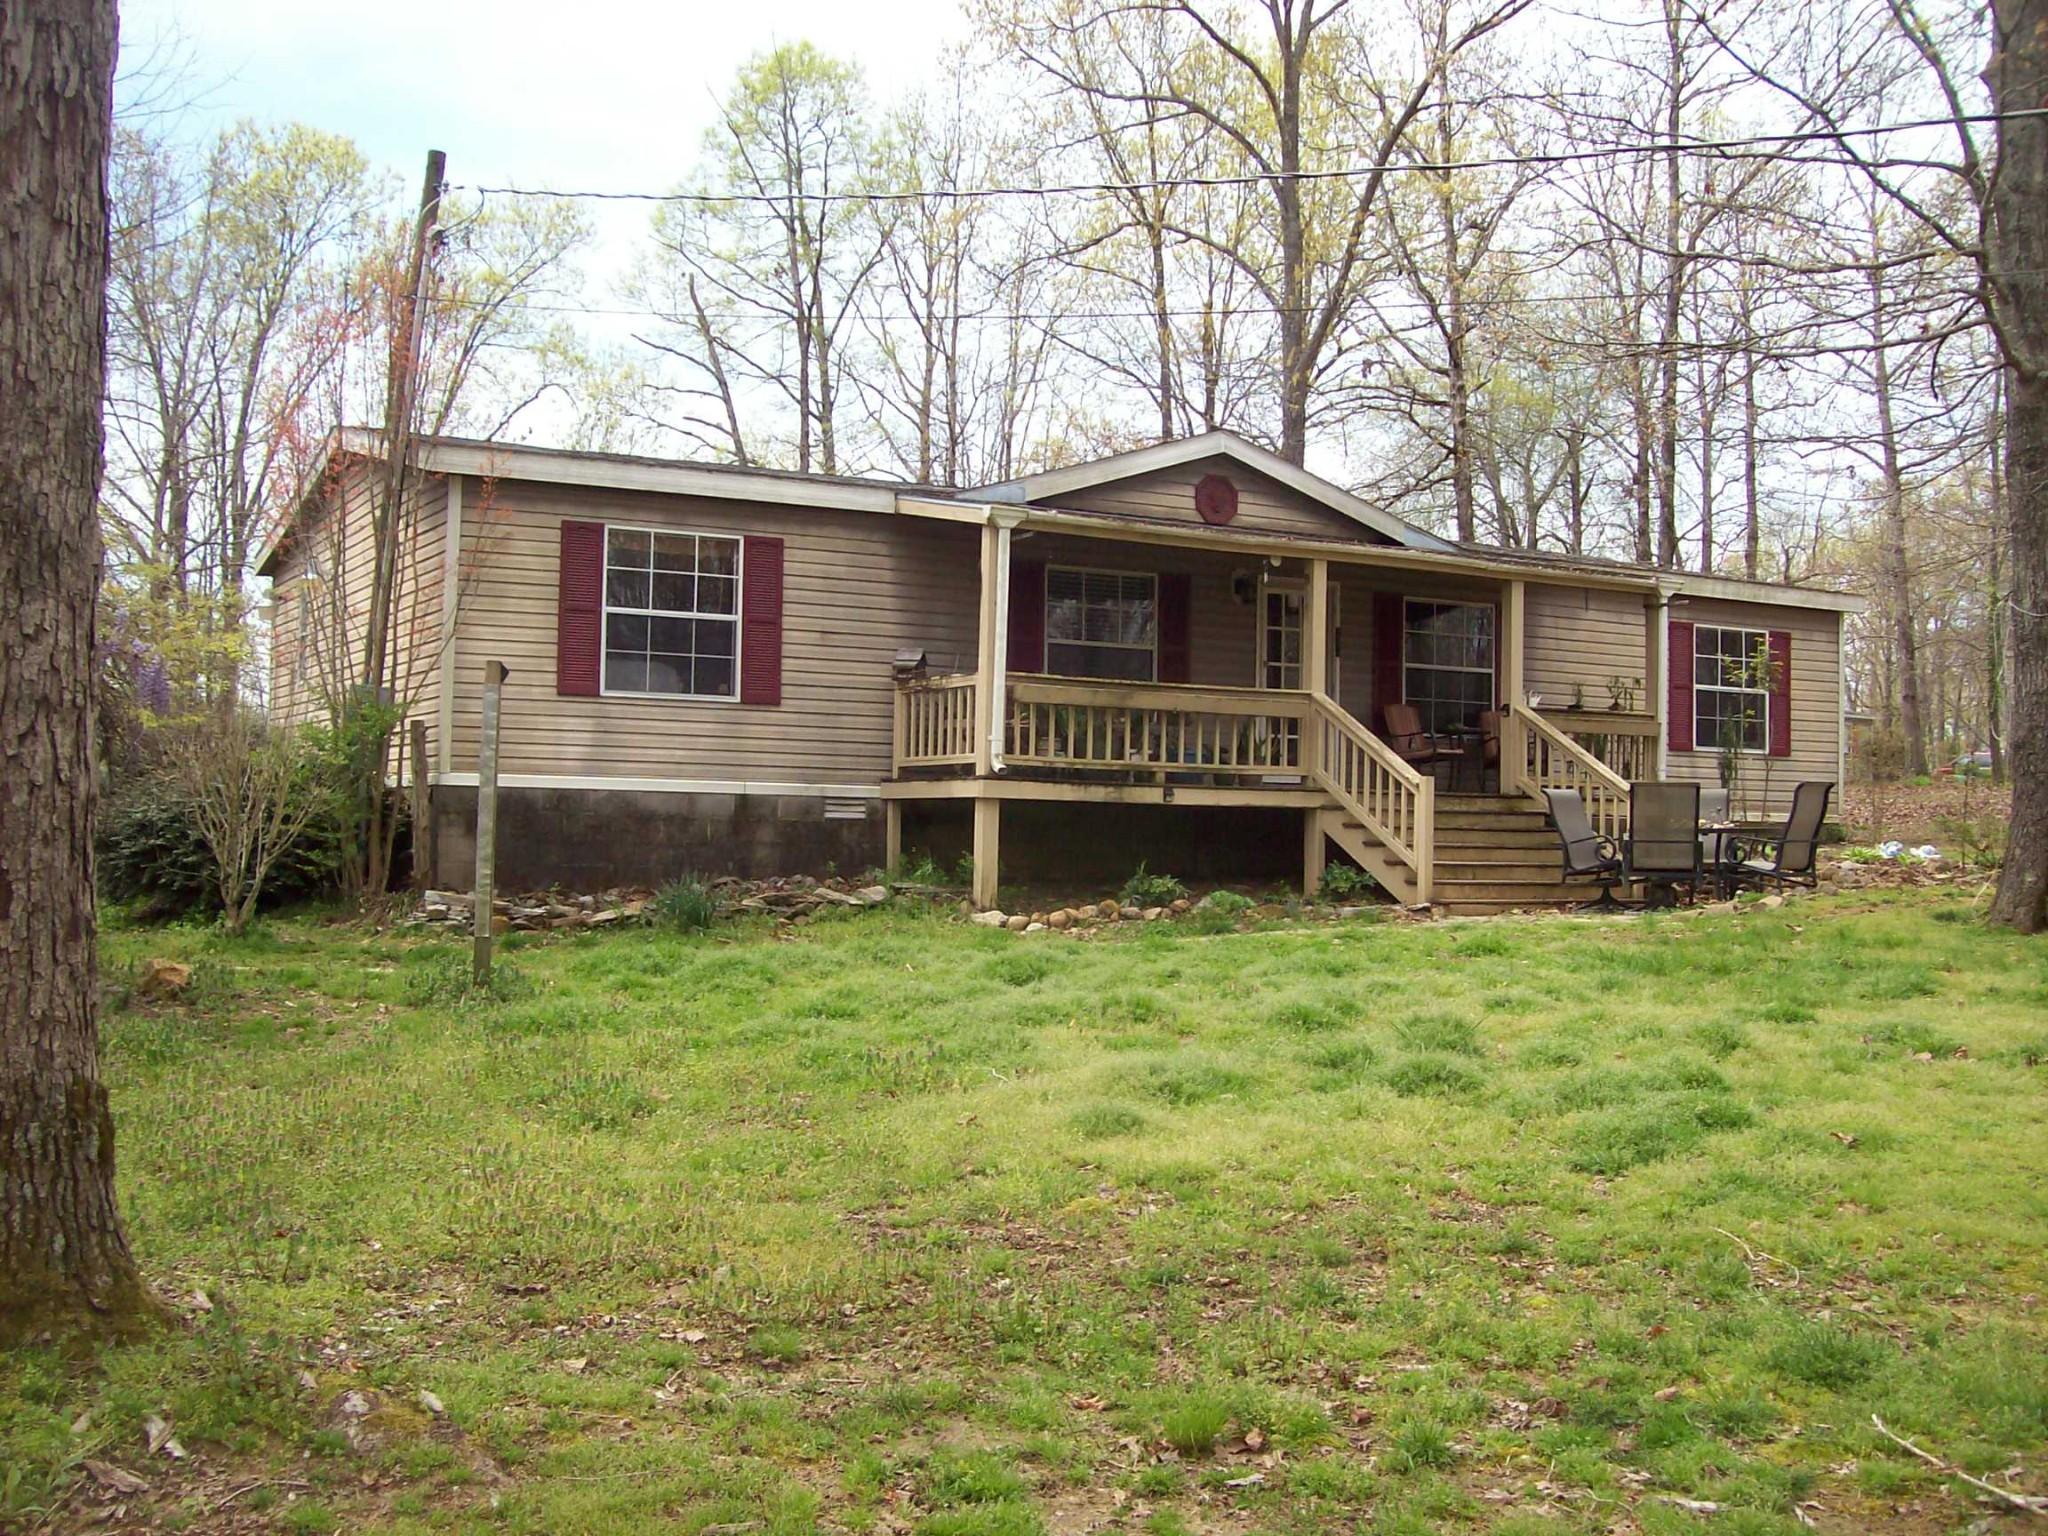 7225 Oak Springs Rd, Nunnelly, TN 37137 - Nunnelly, TN real estate listing